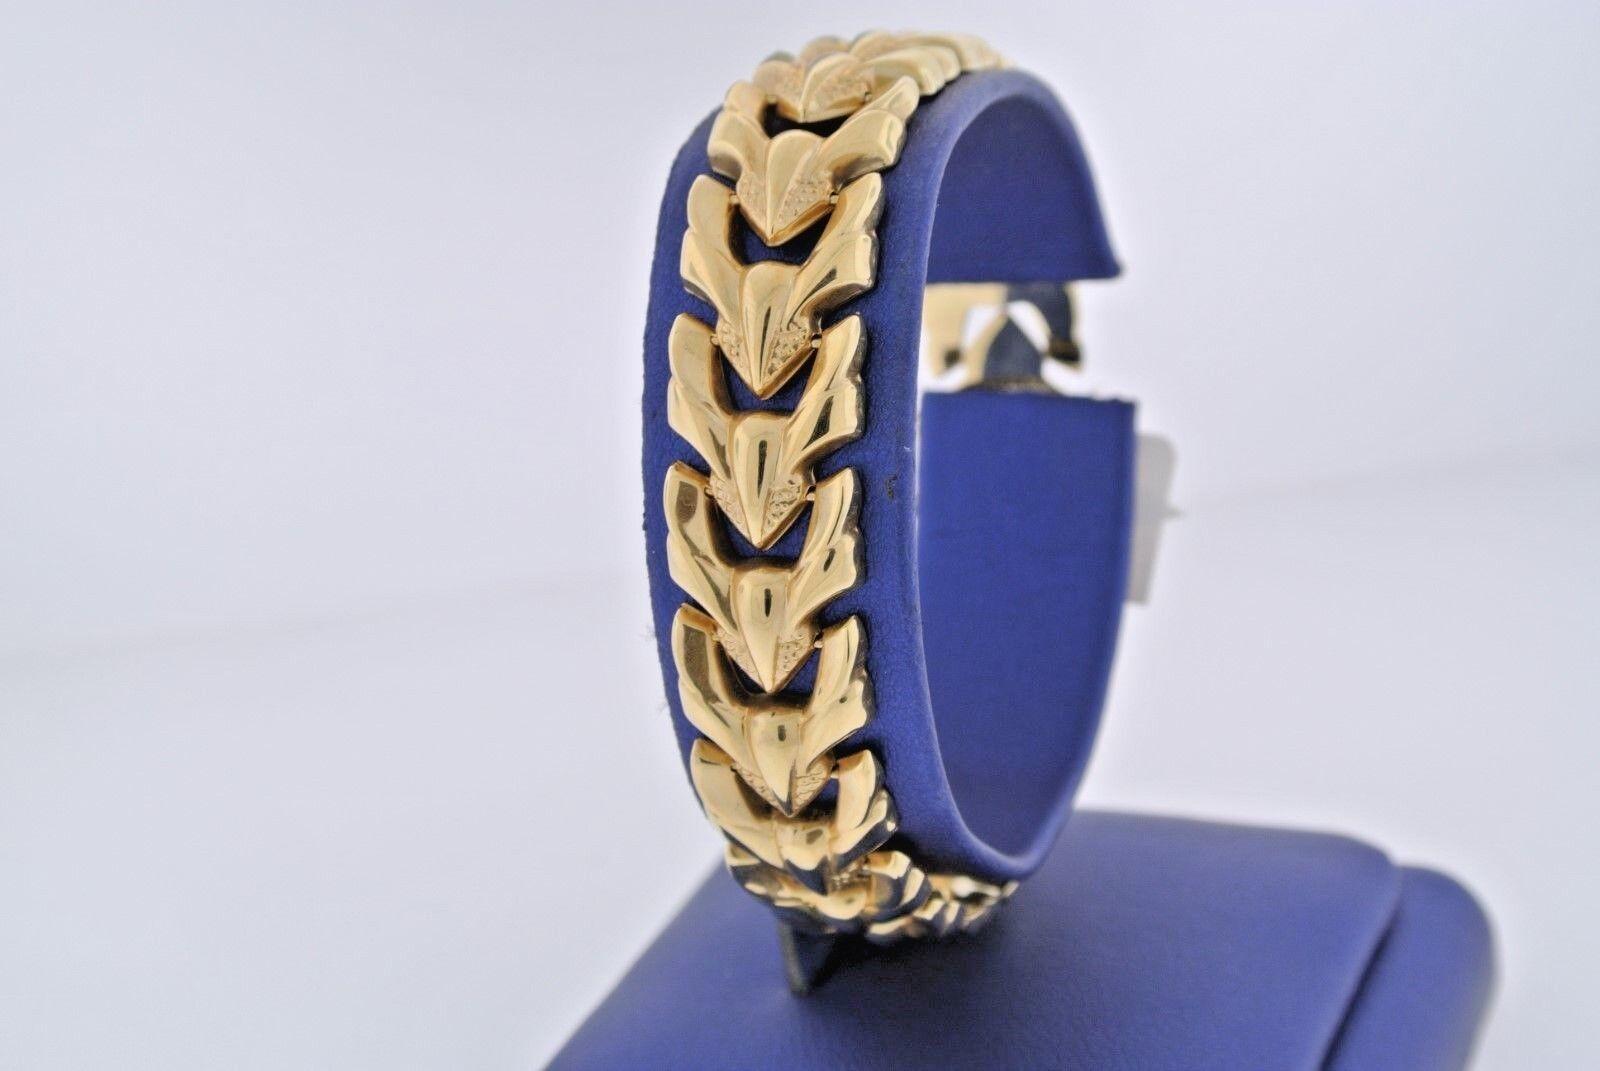 14k Yellow gold Ladies Fancy Bracelet, 7 Inches, 12.9gm, S103721